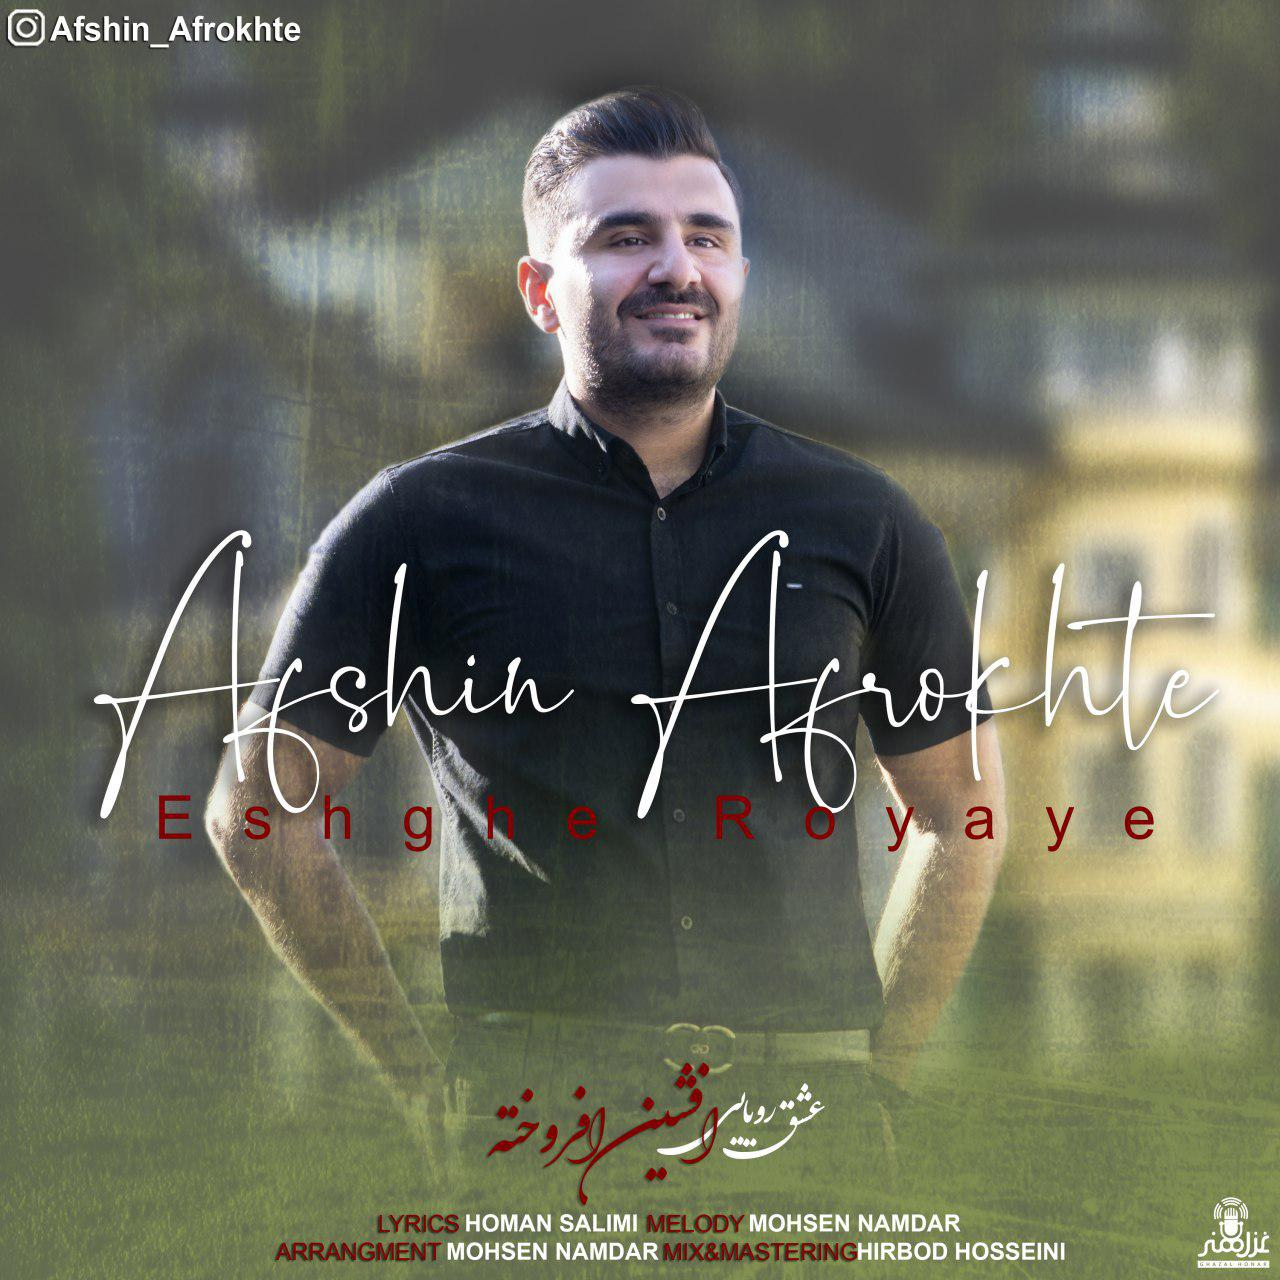 Afshin Afrokhte – Eshghe Royaye